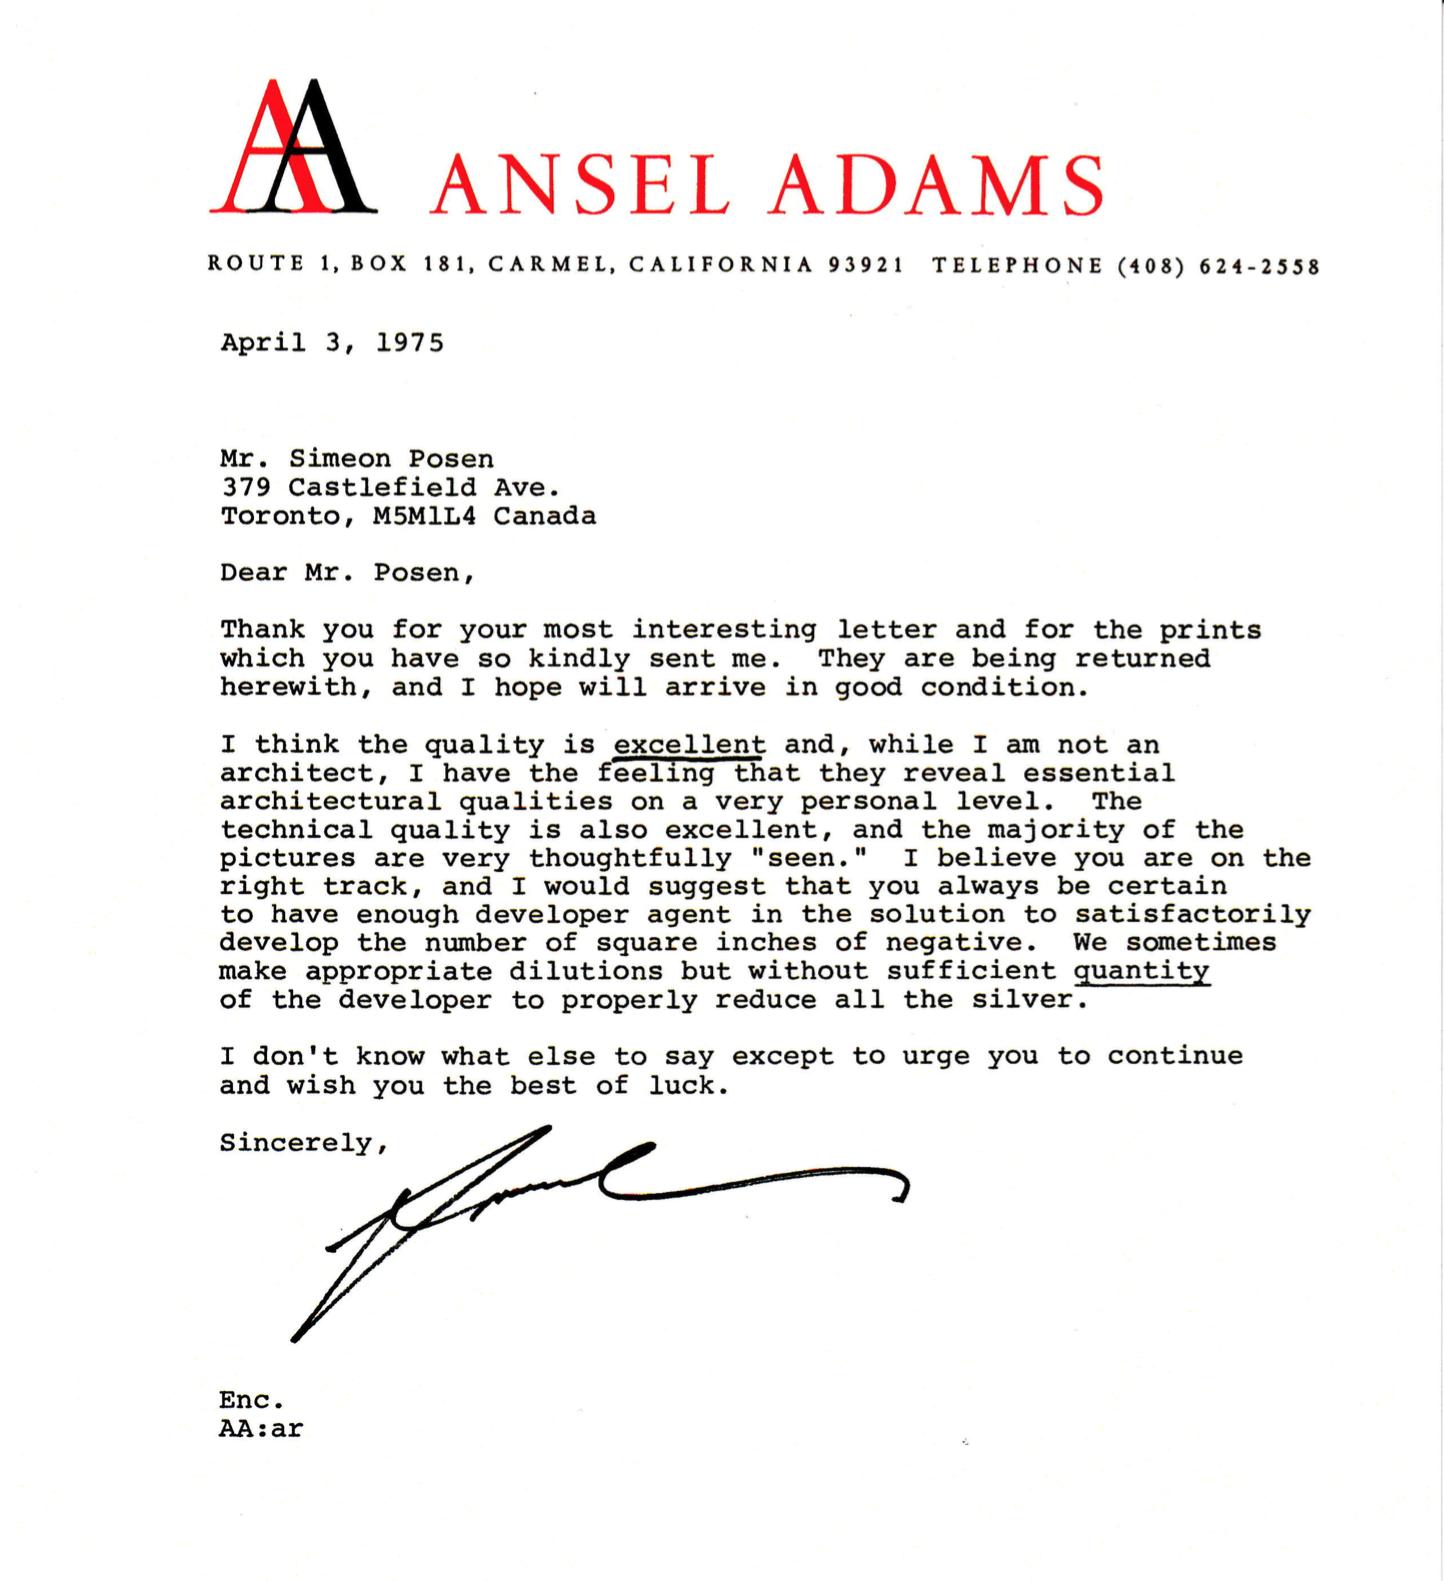 Ansel Adams Feedback Letter